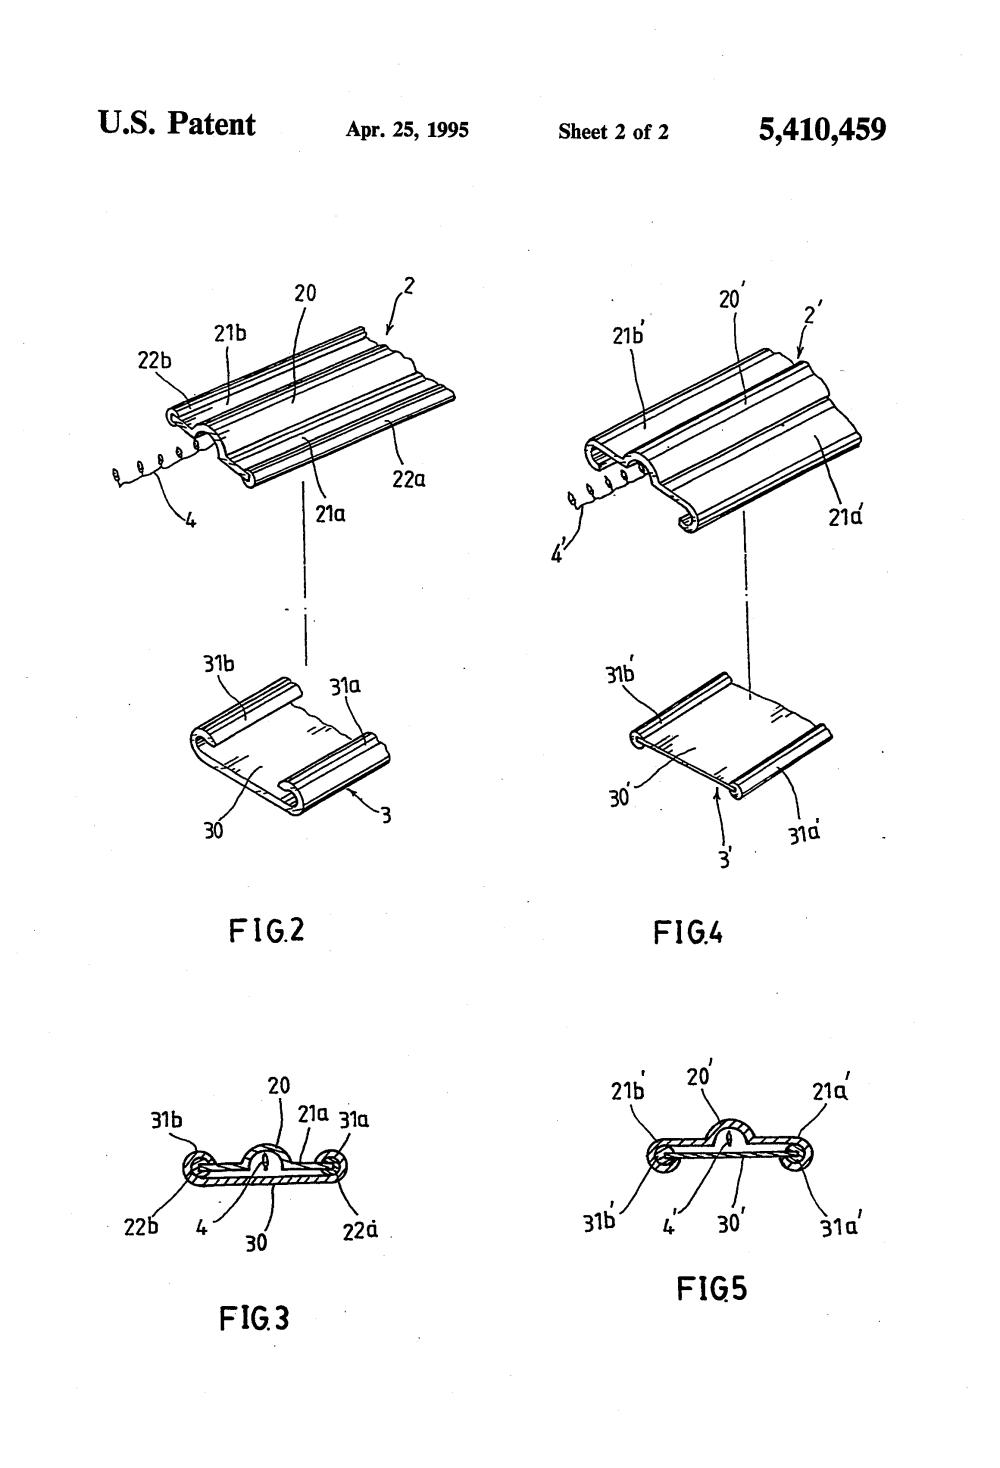 medium resolution of strip lighting google patents on wiring led light strips in parallel patent us5410459 lighting ornament google